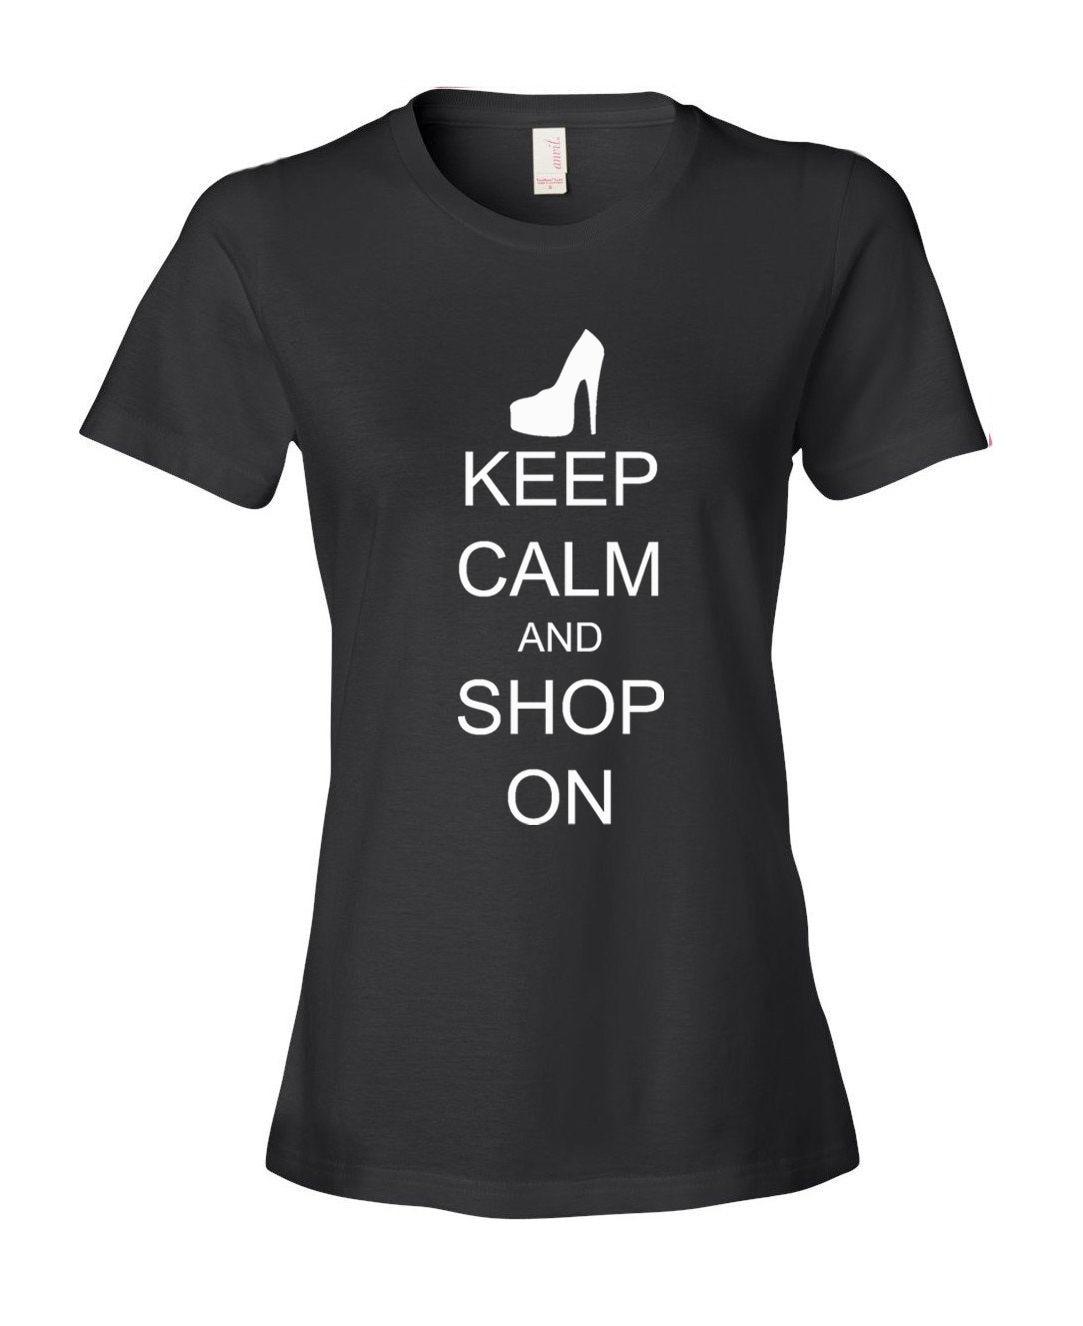 Keep Calm and Shop on High Heel Womens Ladies Fashion Fit T-Shirt Shirt